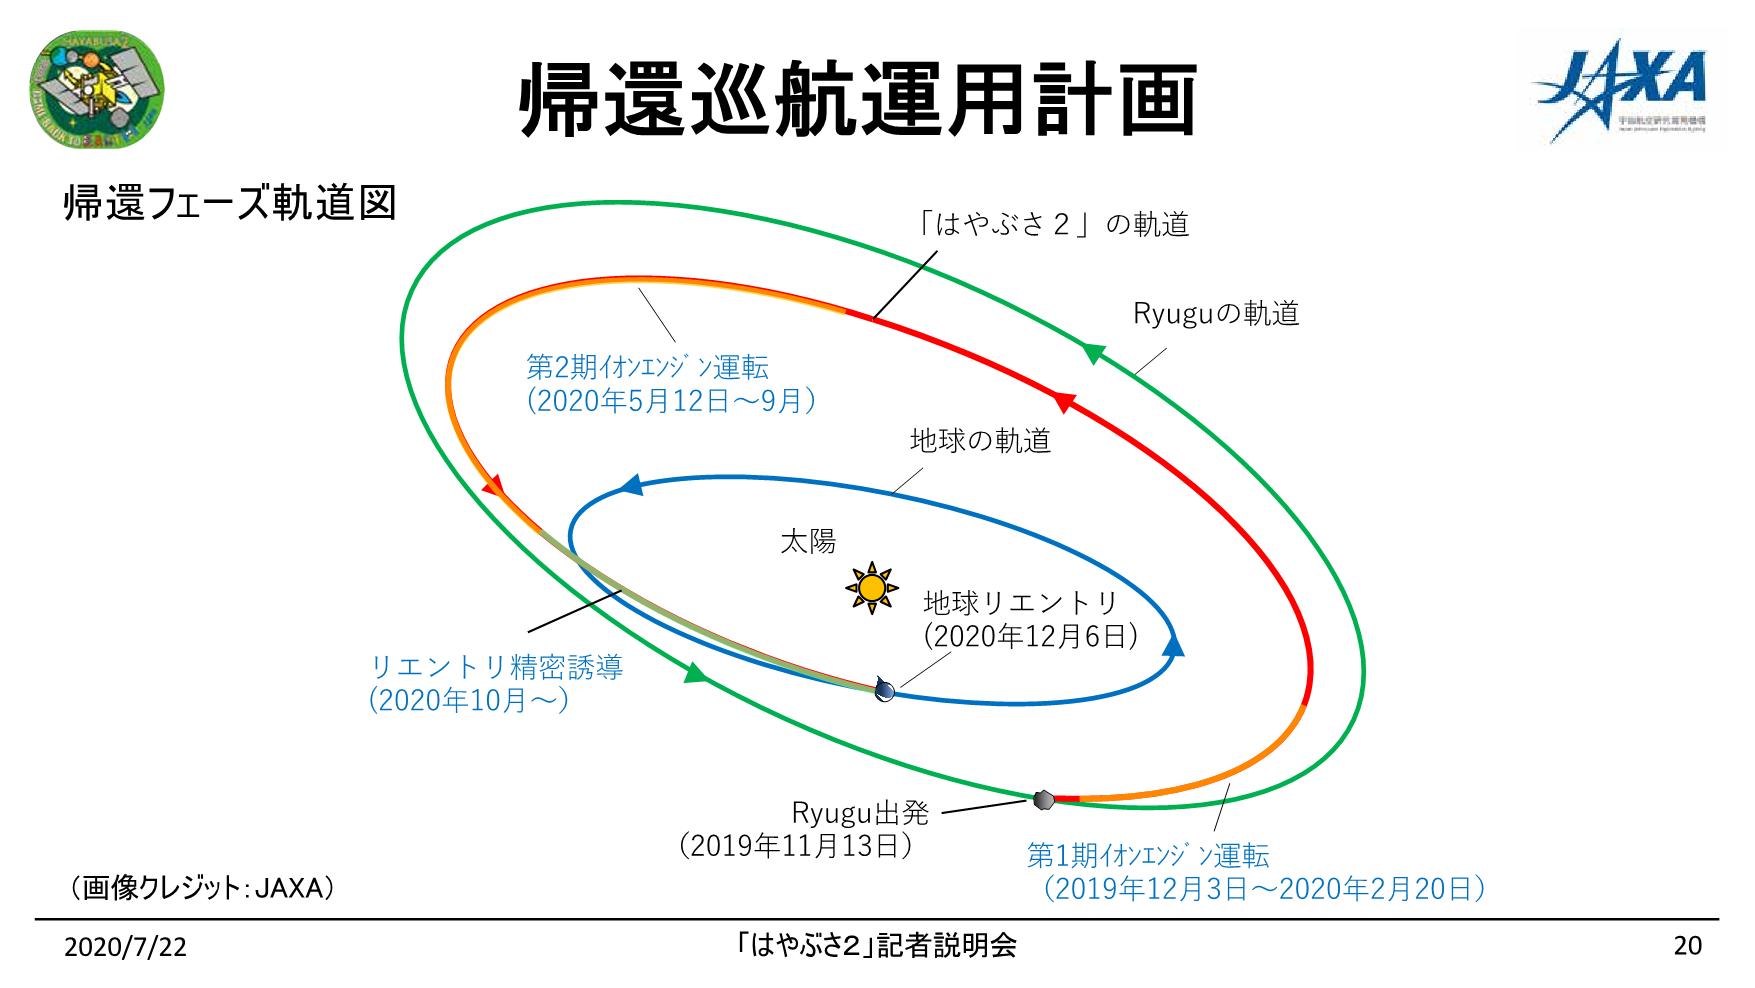 f:id:Imamura:20200722140808p:plain